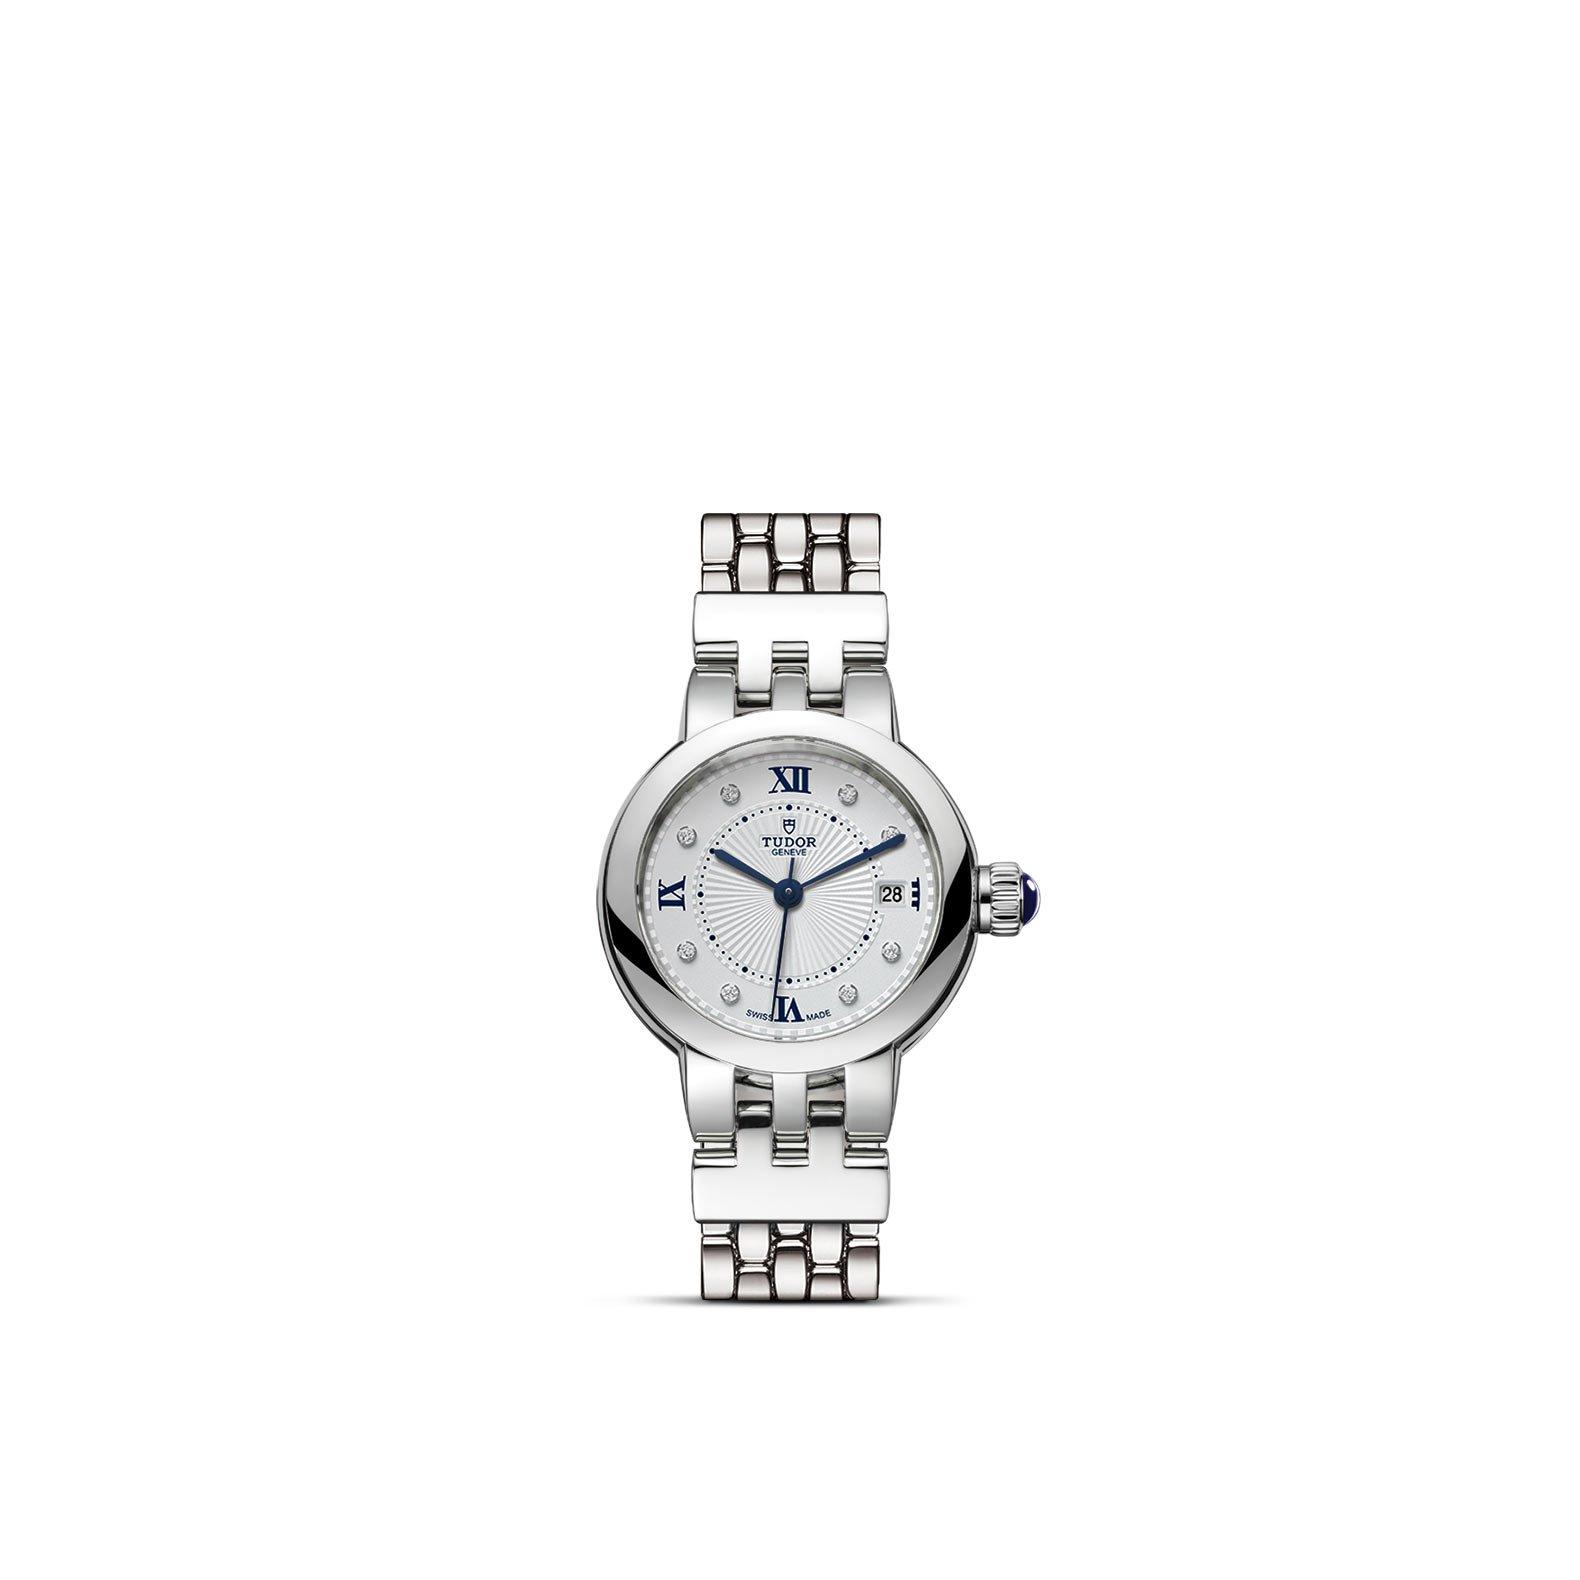 Montre TUDOR Clair de Rose boîtier en acier, 26mm, bracelet en acier vue 1